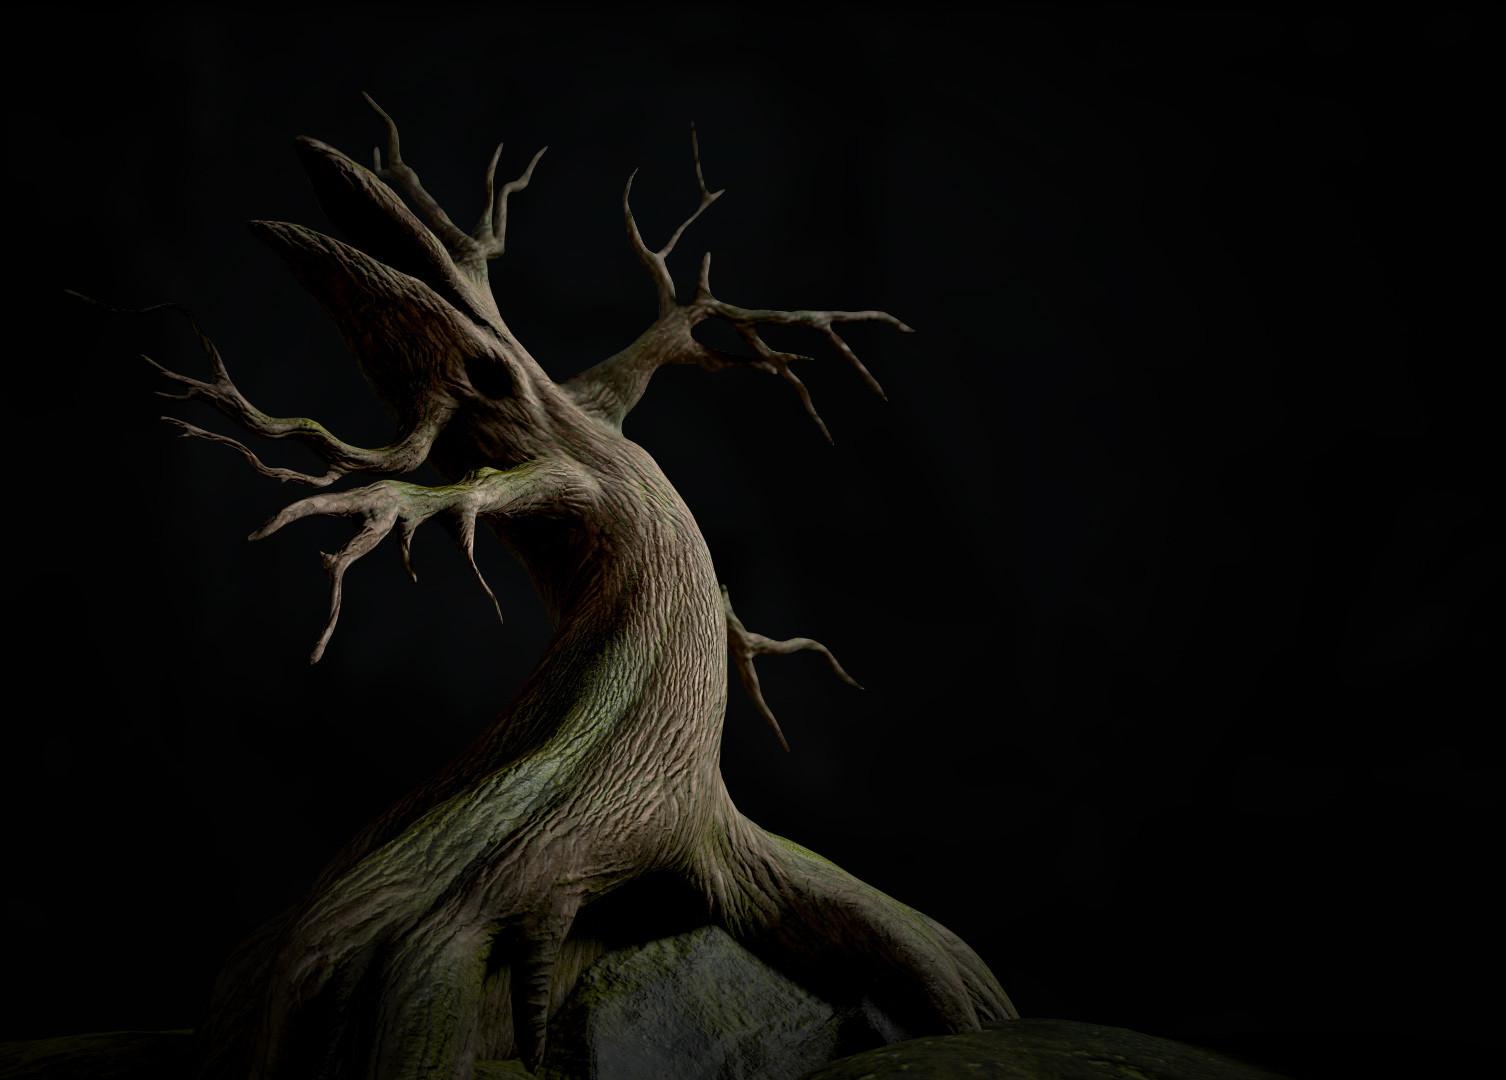 Sleepy Hollow tree